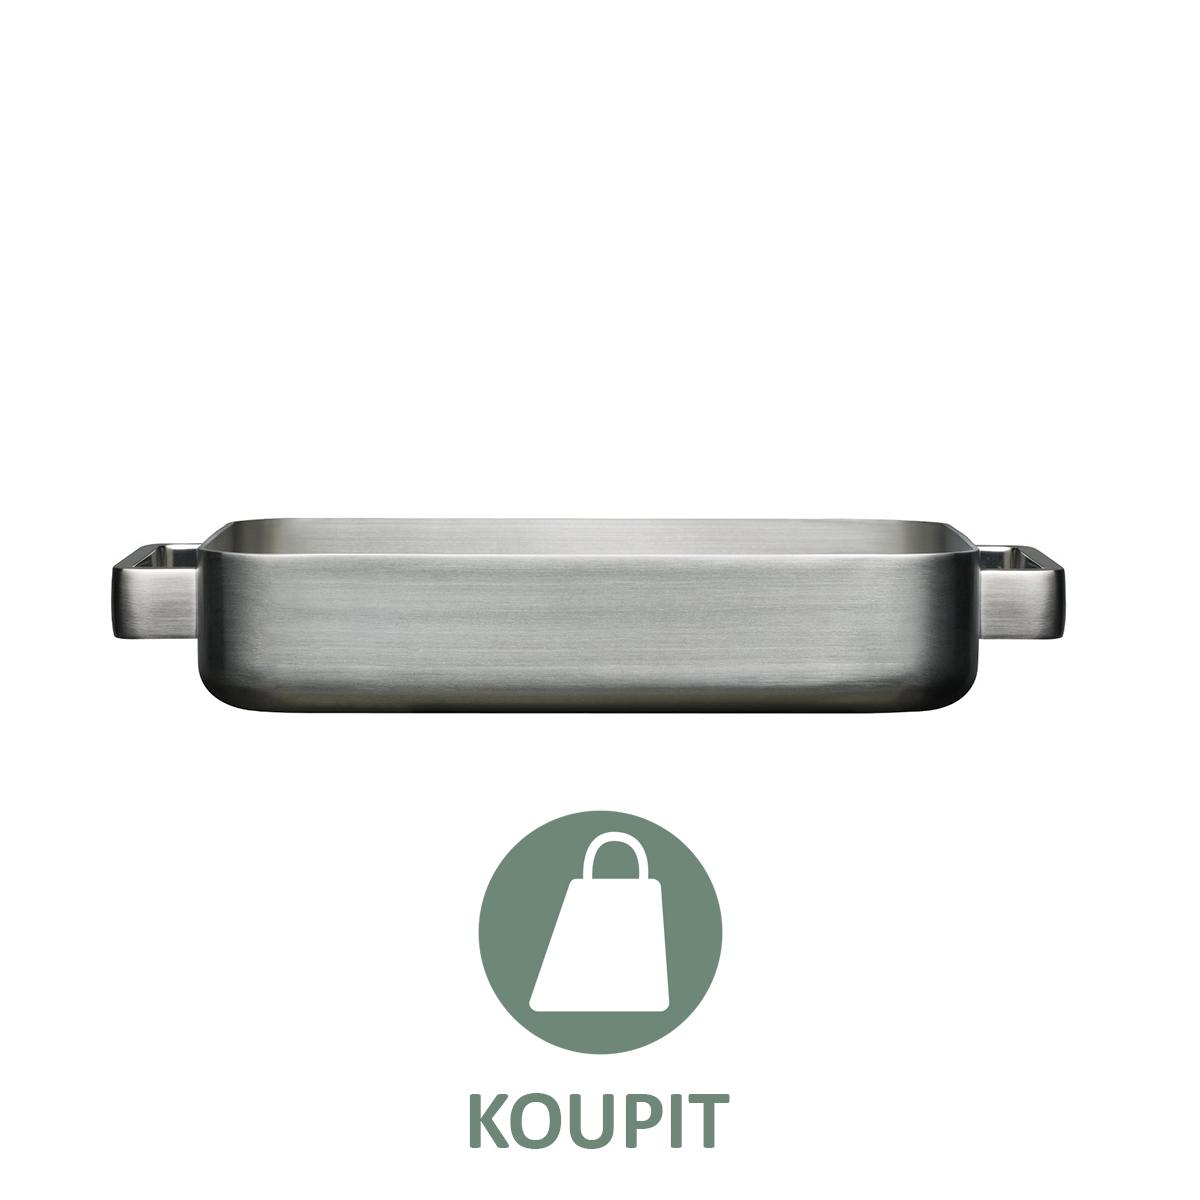 nejkrasnejsi-design-hrncu-tools-produkt1